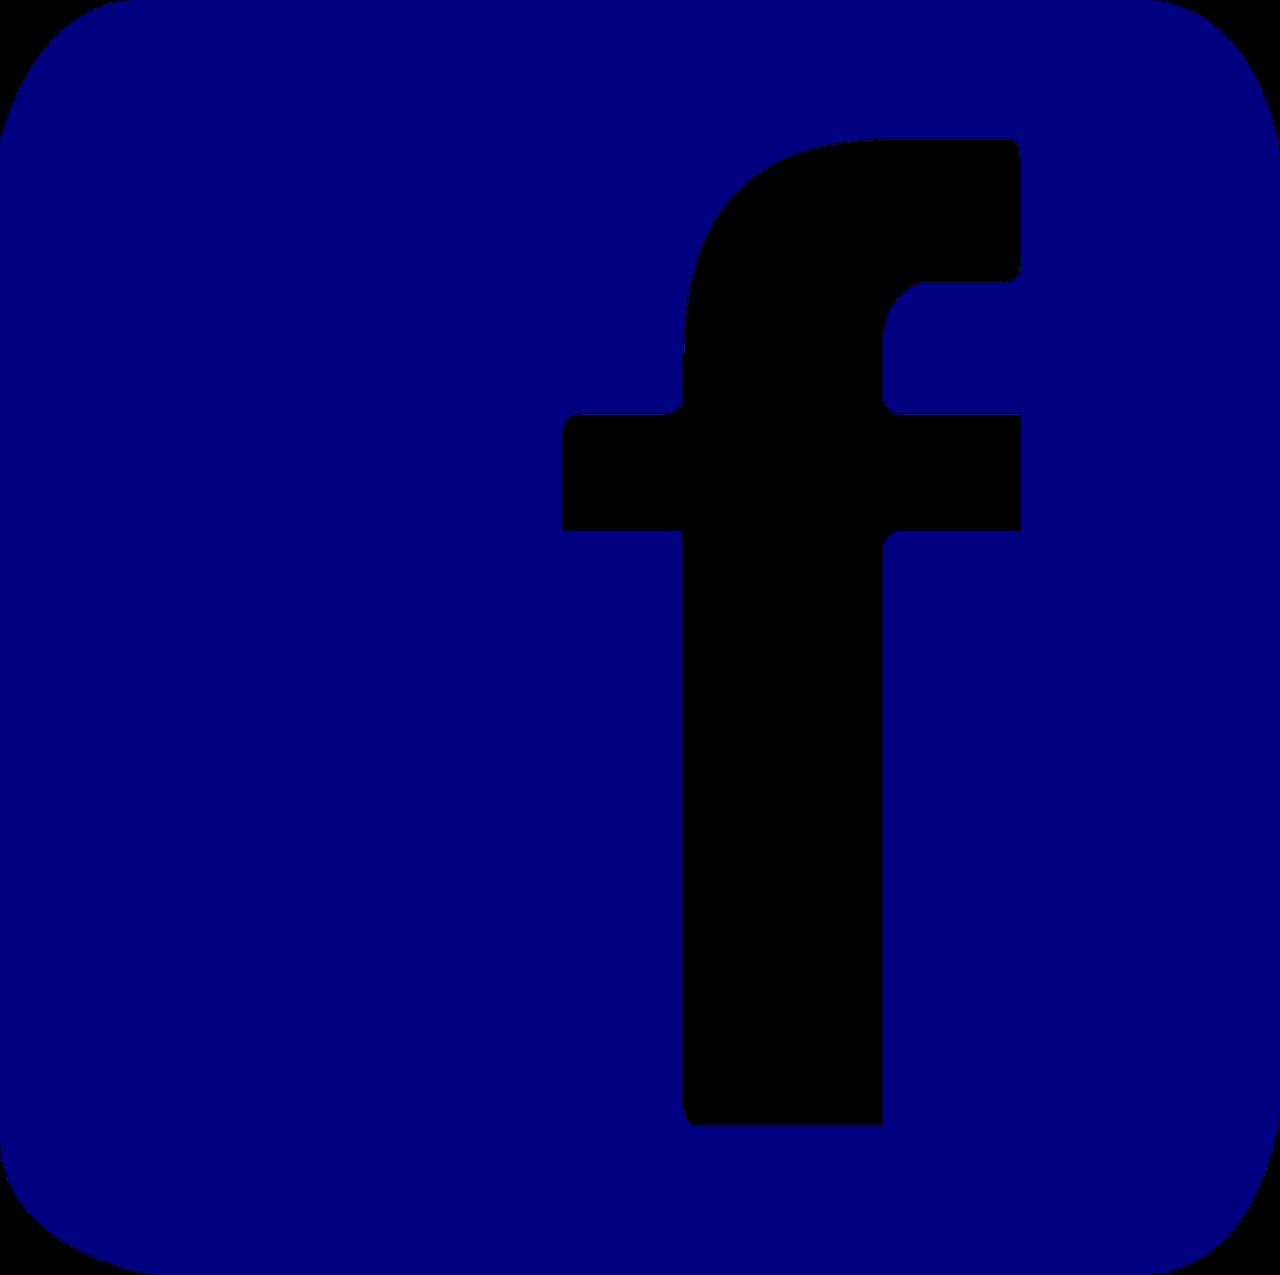 {'Facebook'}/